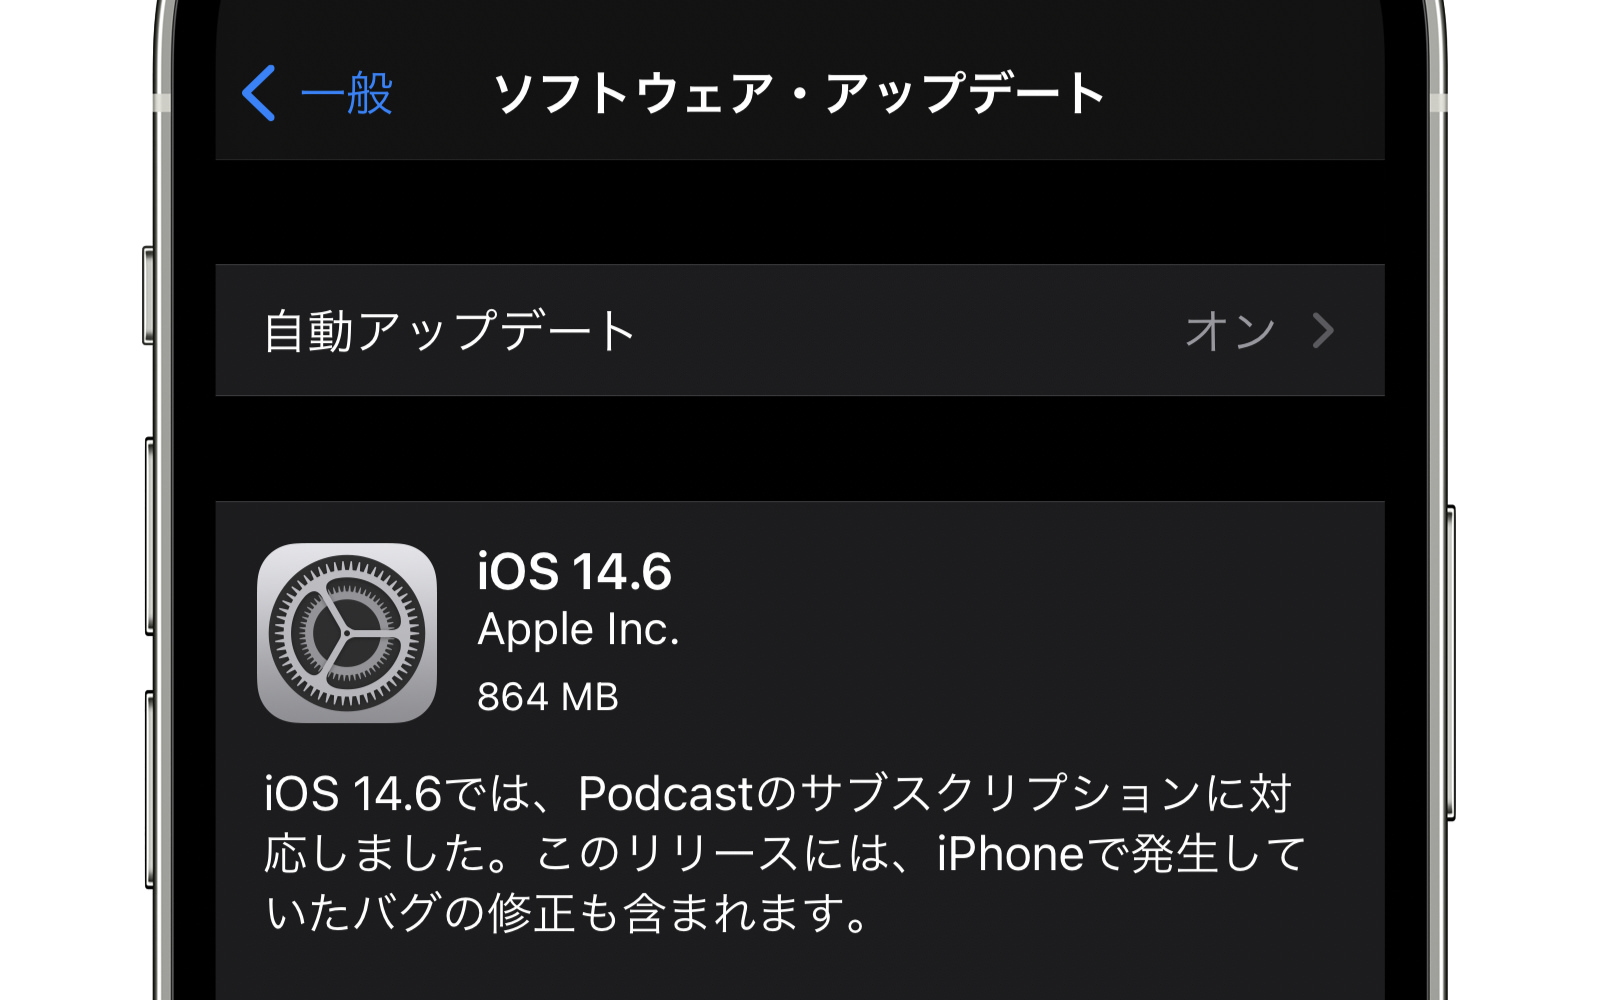 IOS14 6 software update